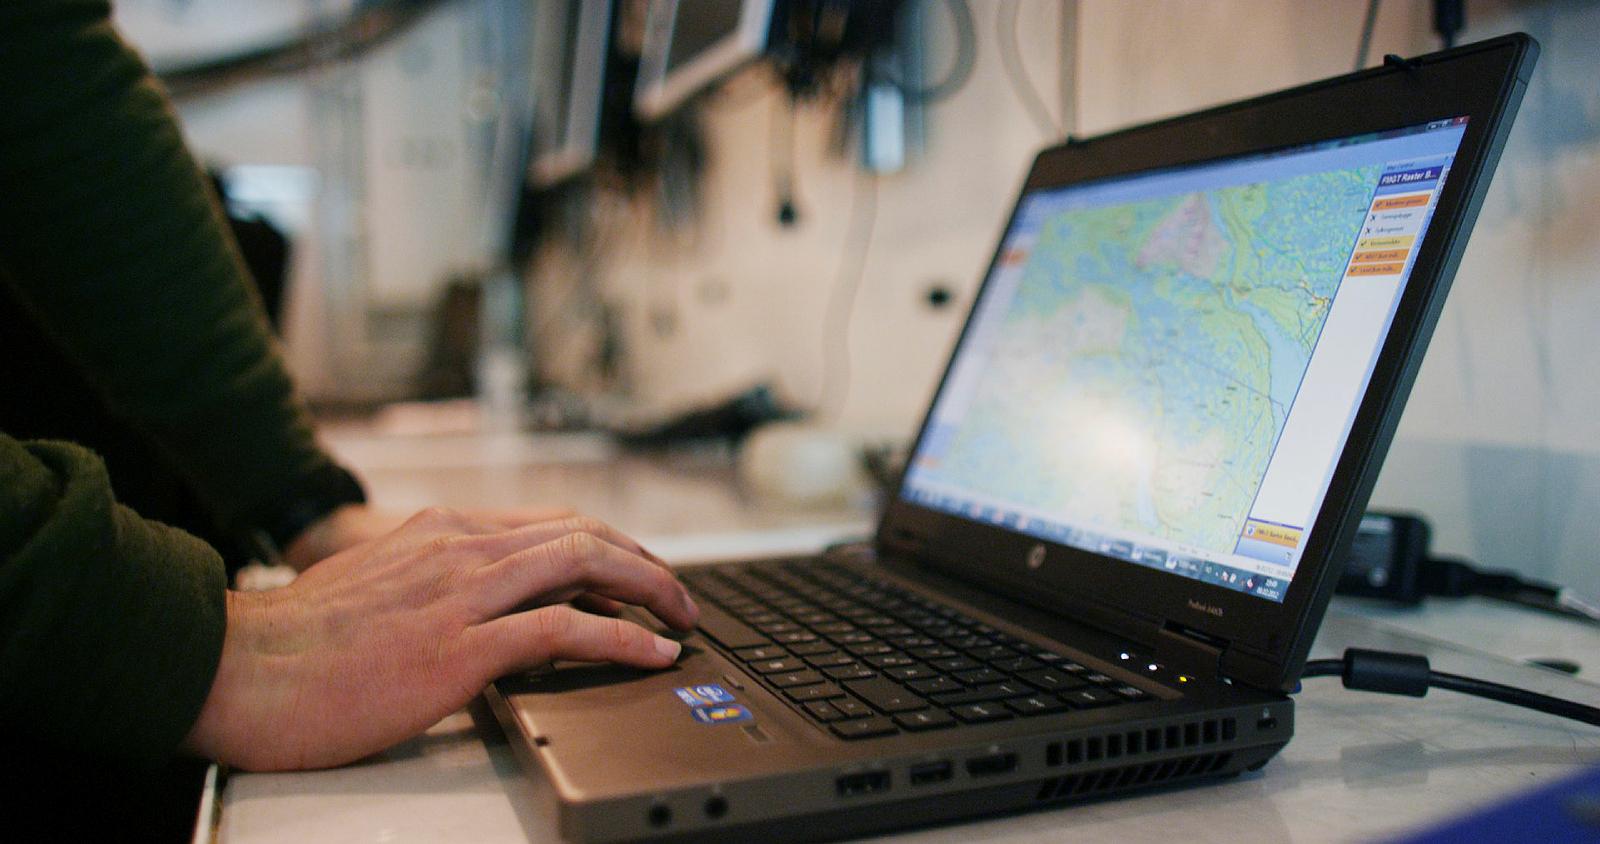 Forsvarets ingeniørhøyskole trener på cyberforsvar